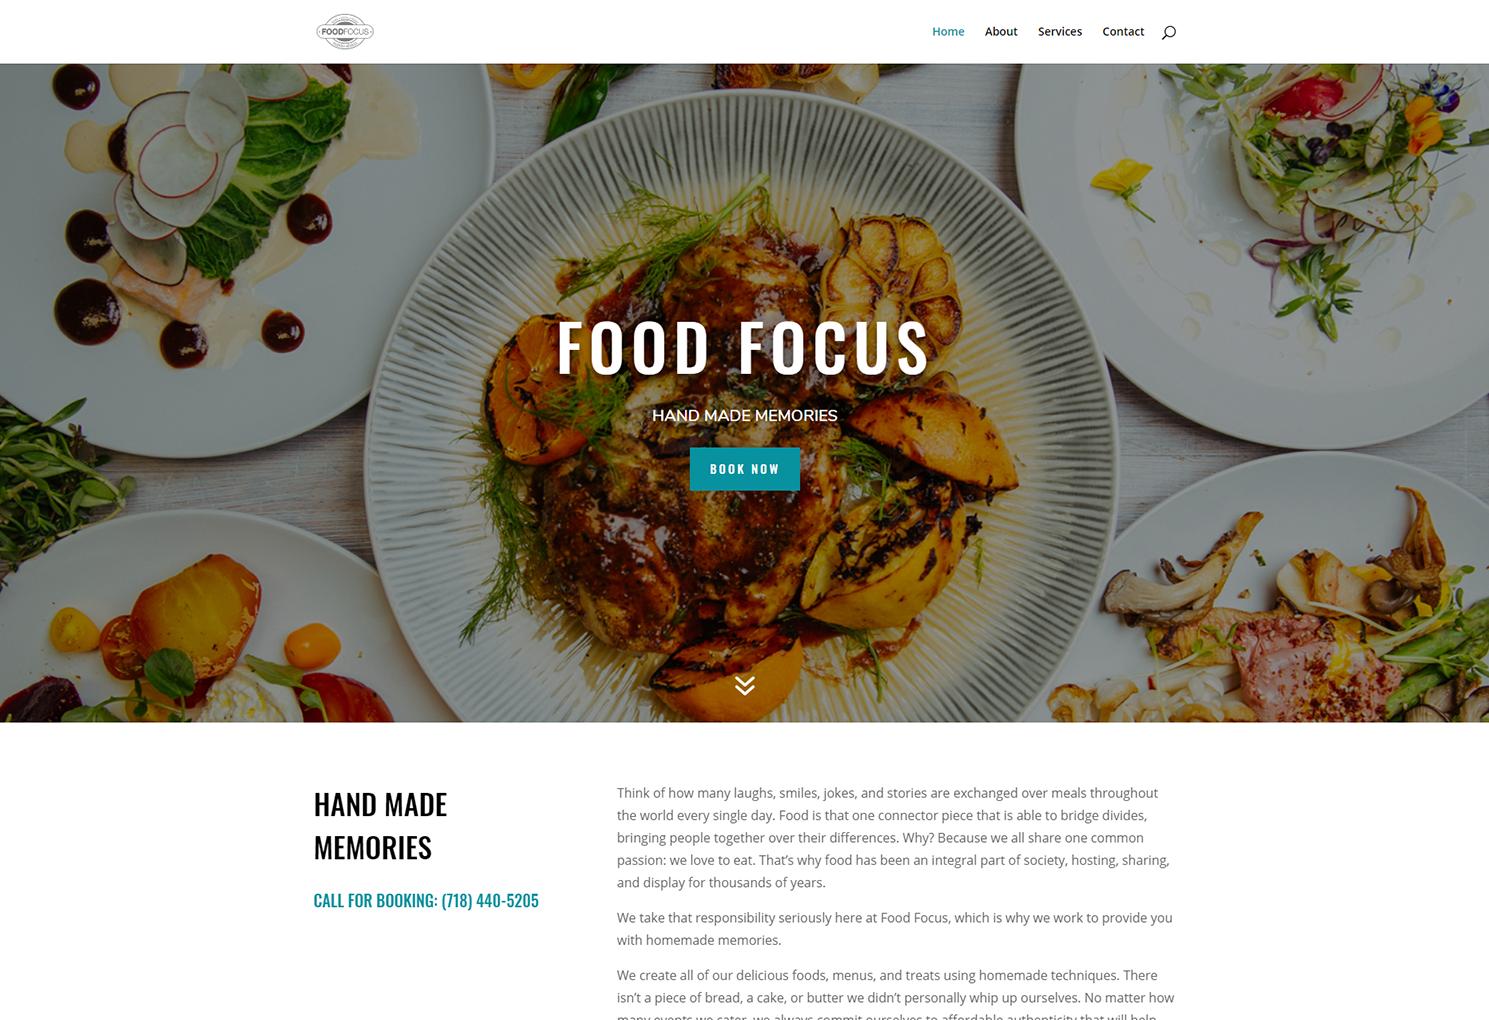 NYC Web Design - NB Technologies The Food Focus Screenshot